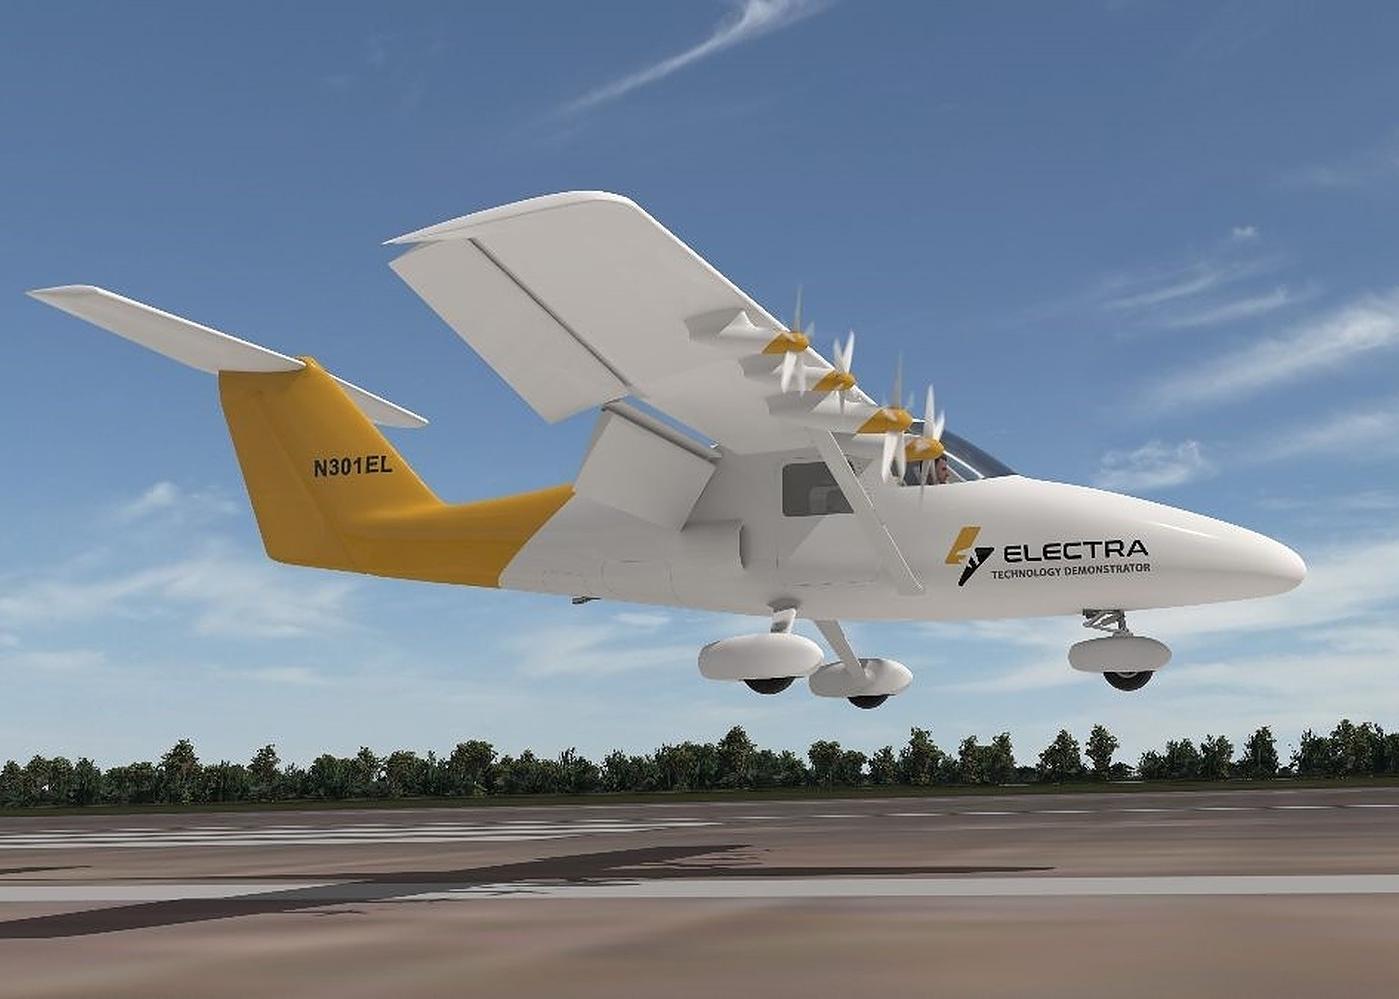 Electra.aero eSTOL tech demonstrator